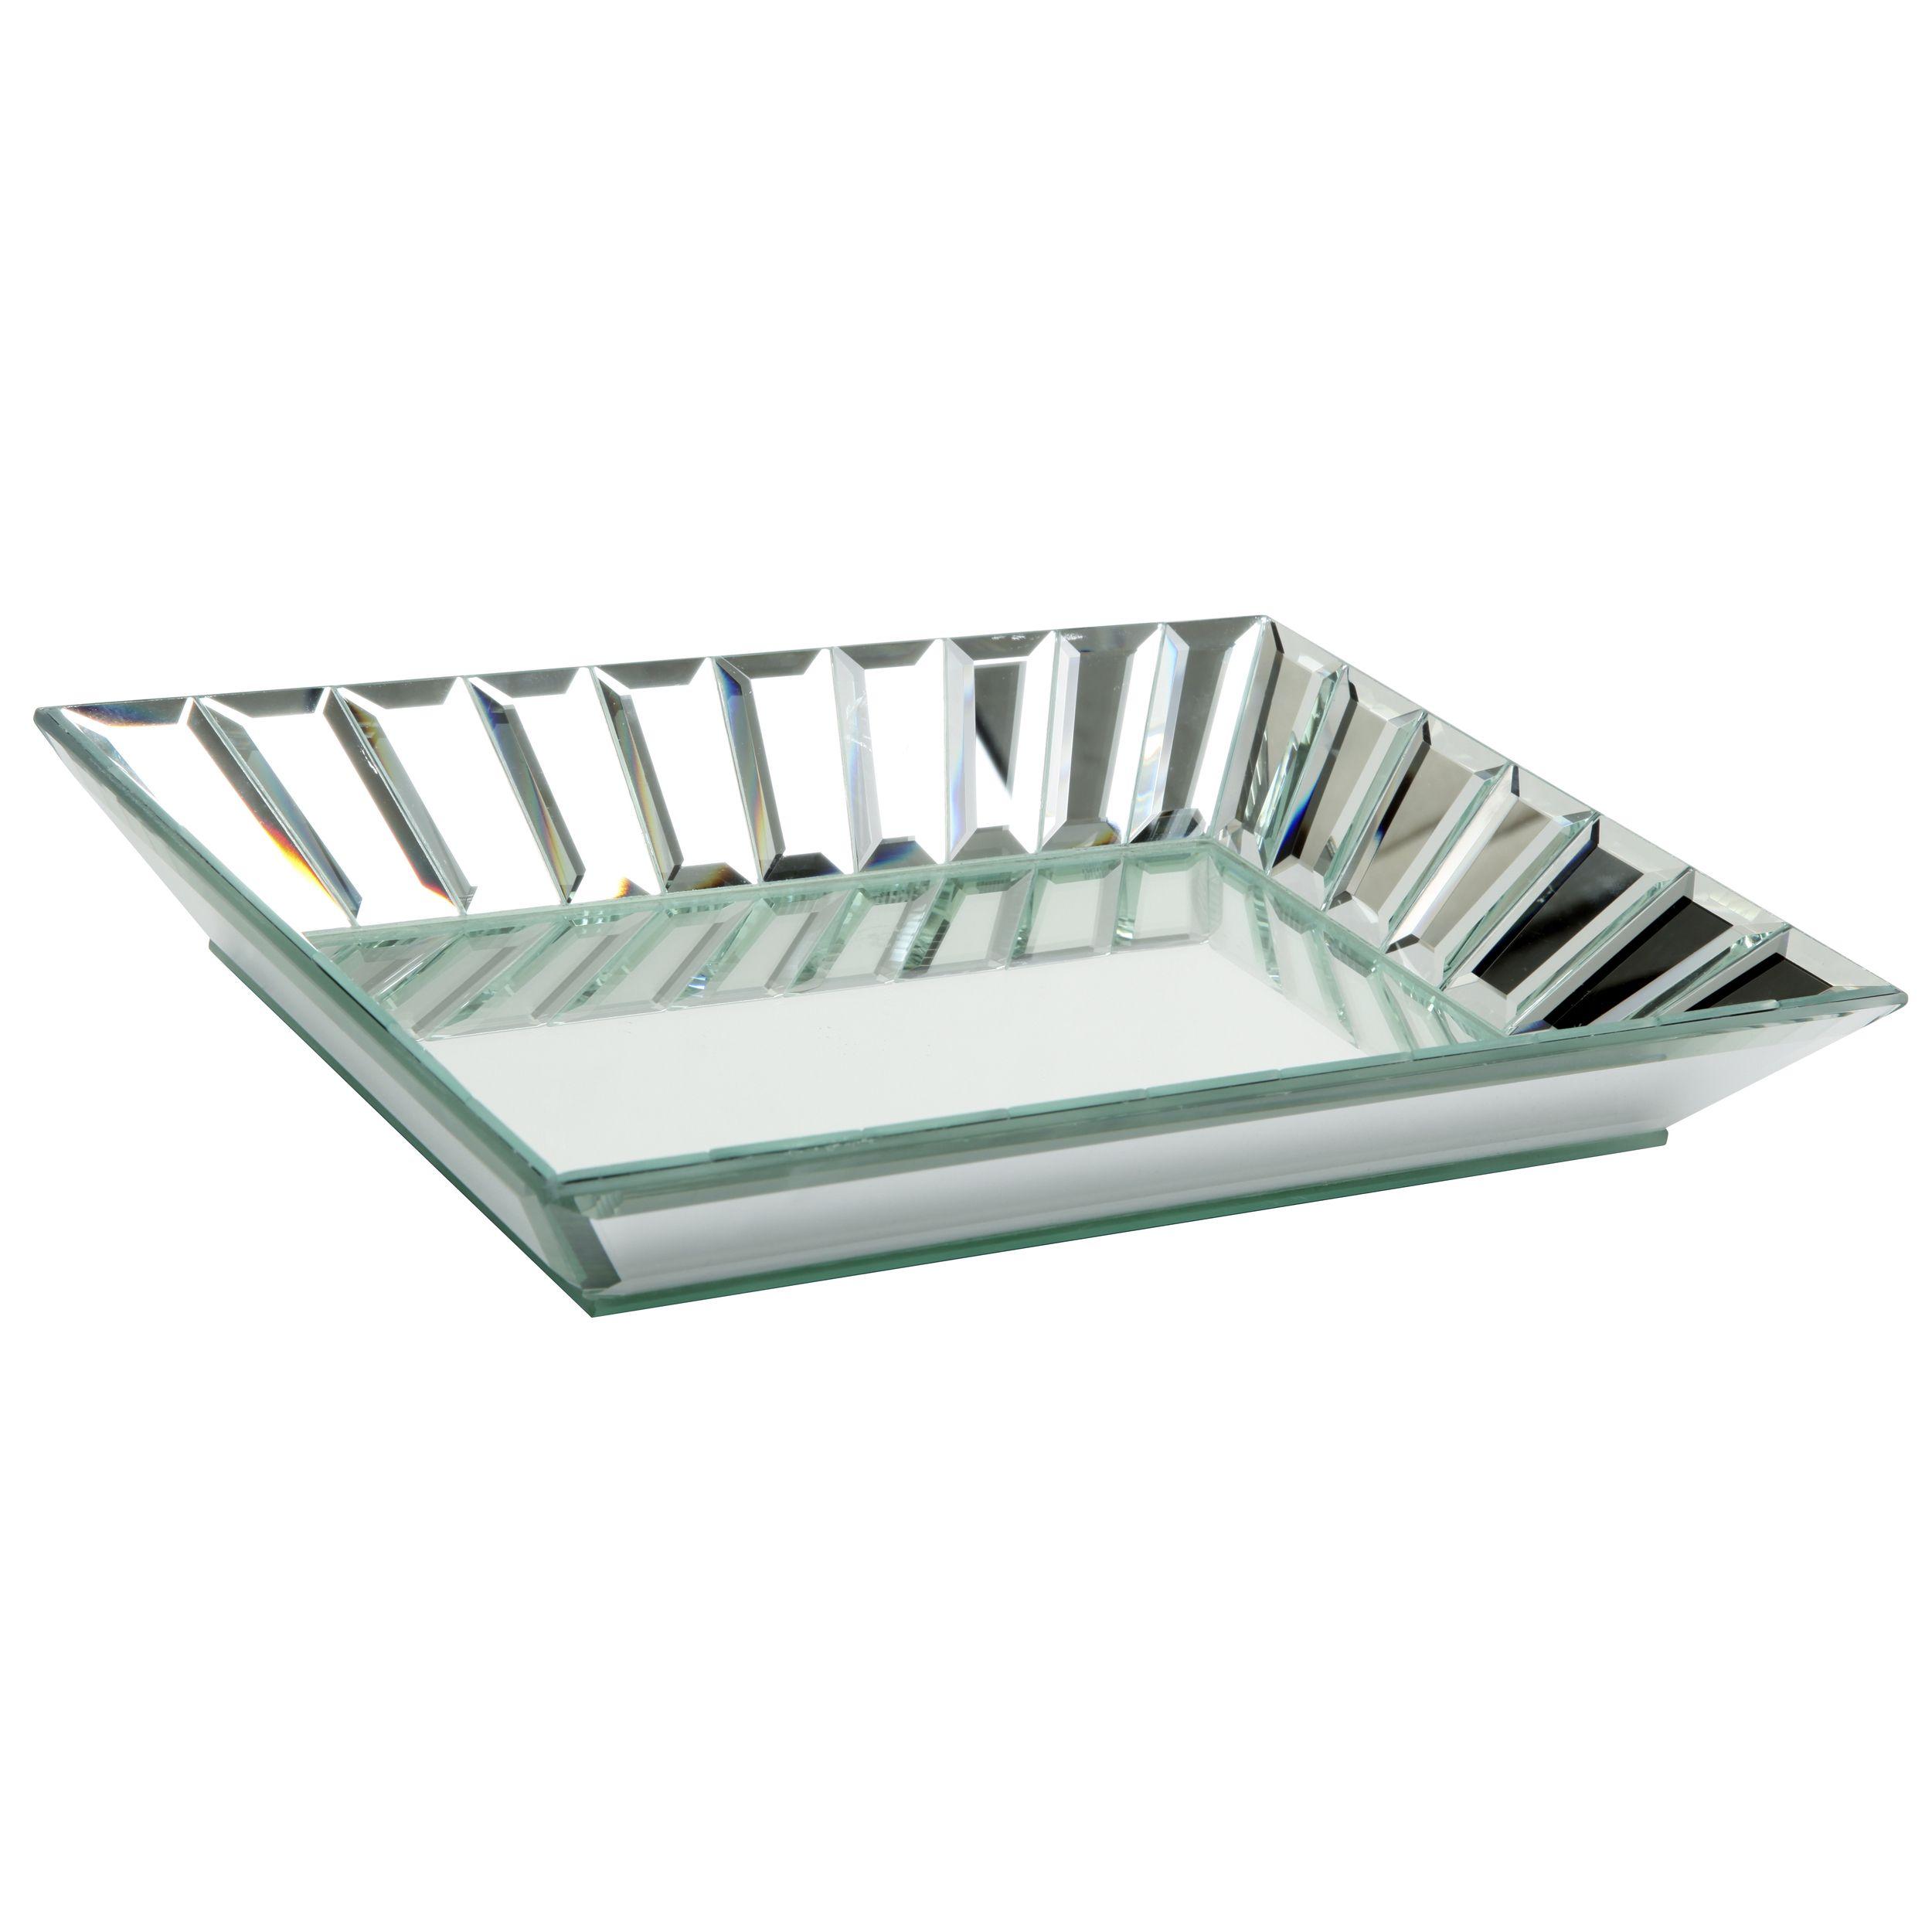 Bright vases trays dishes aroma lamps mirrors in beautiful frames - Laura Ashley Capri Mirror Tray 21